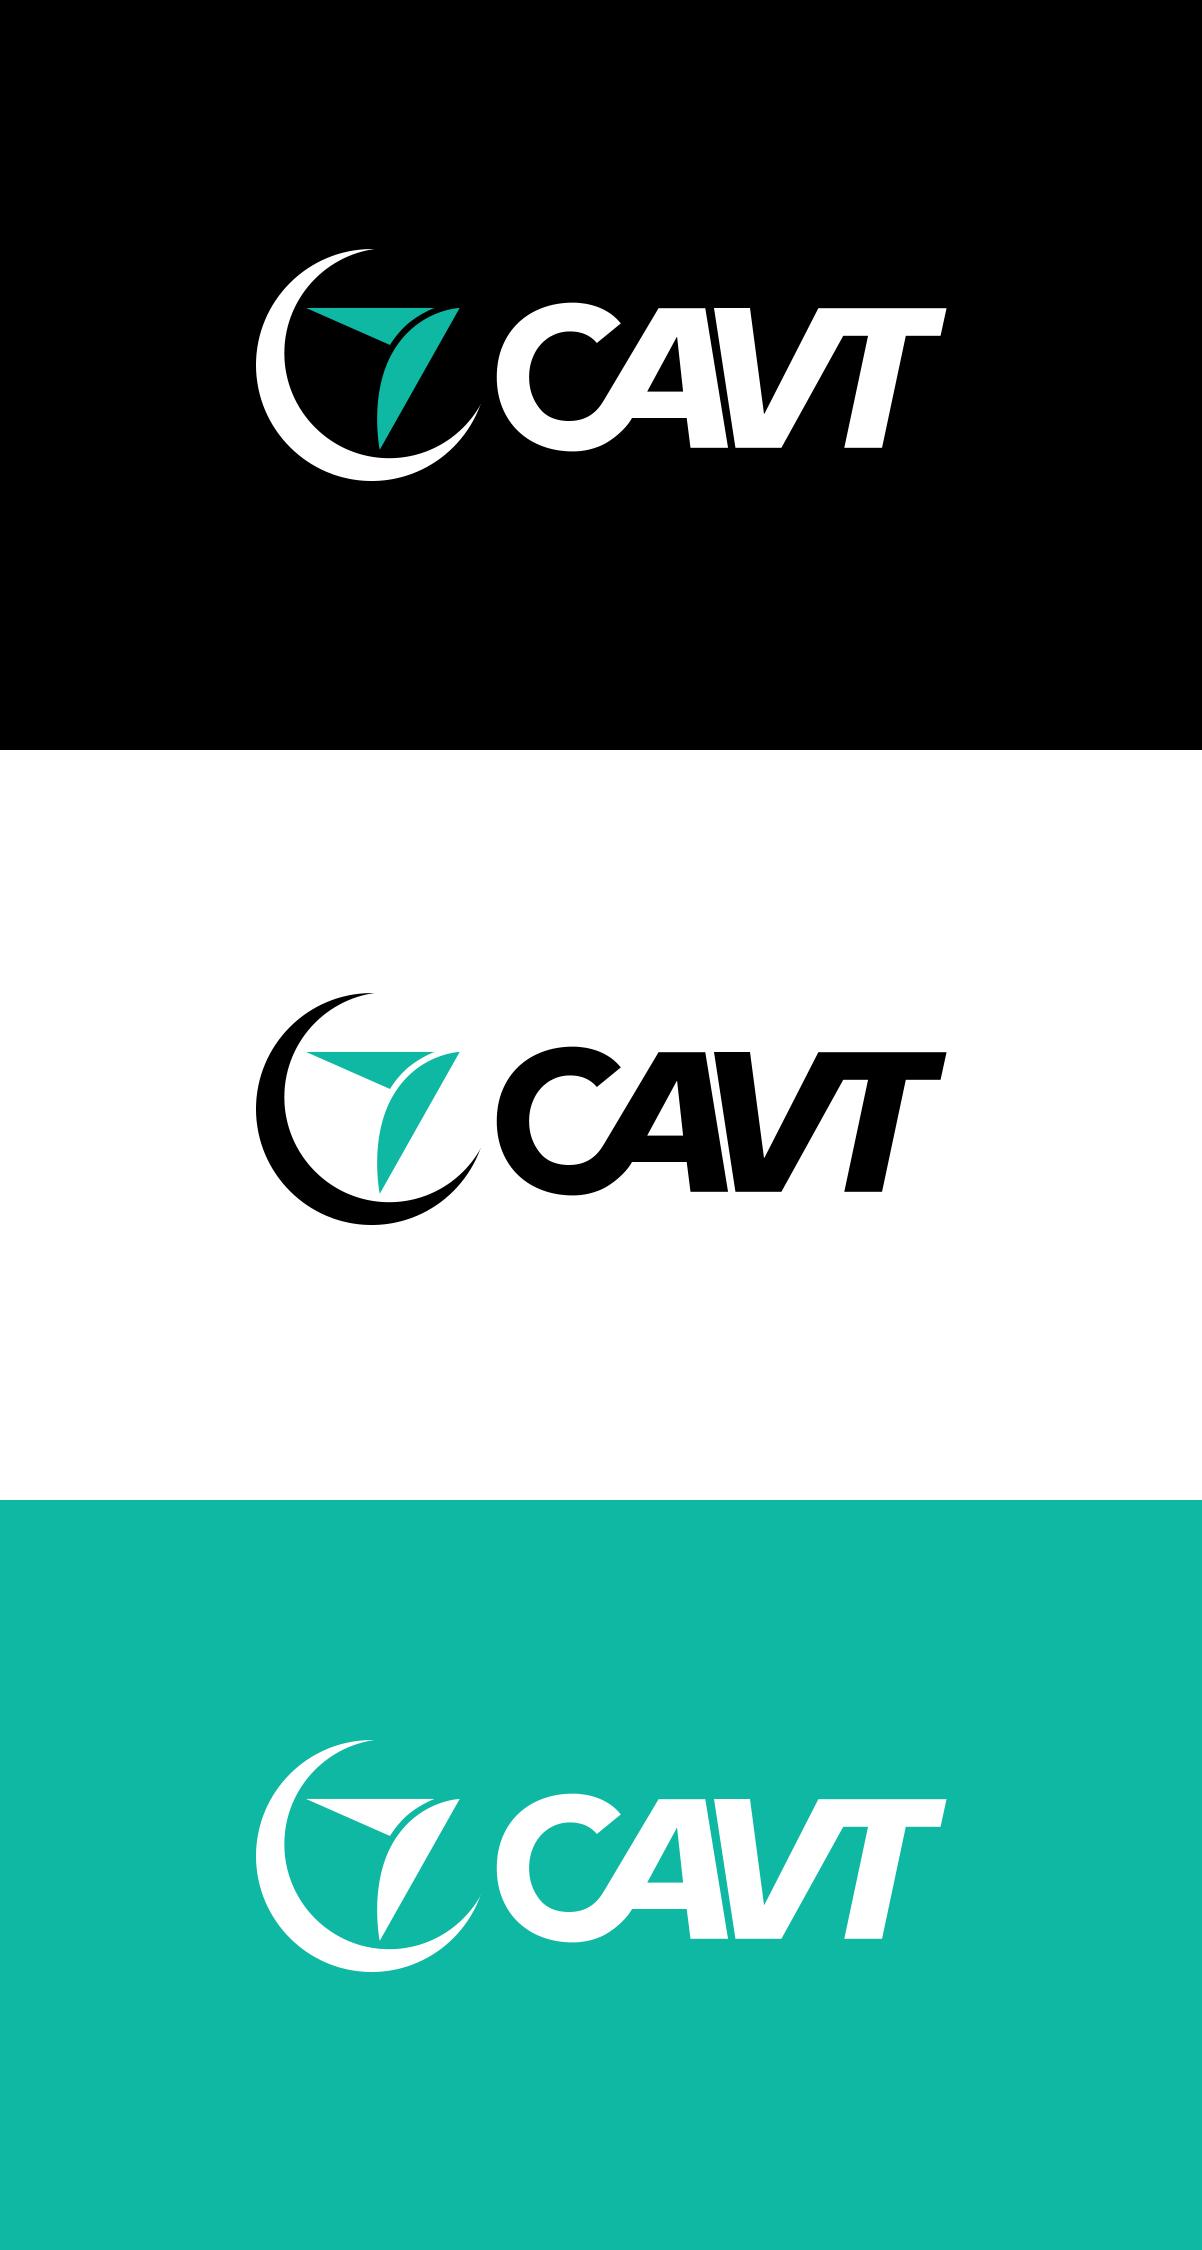 Cavt logo v1 01